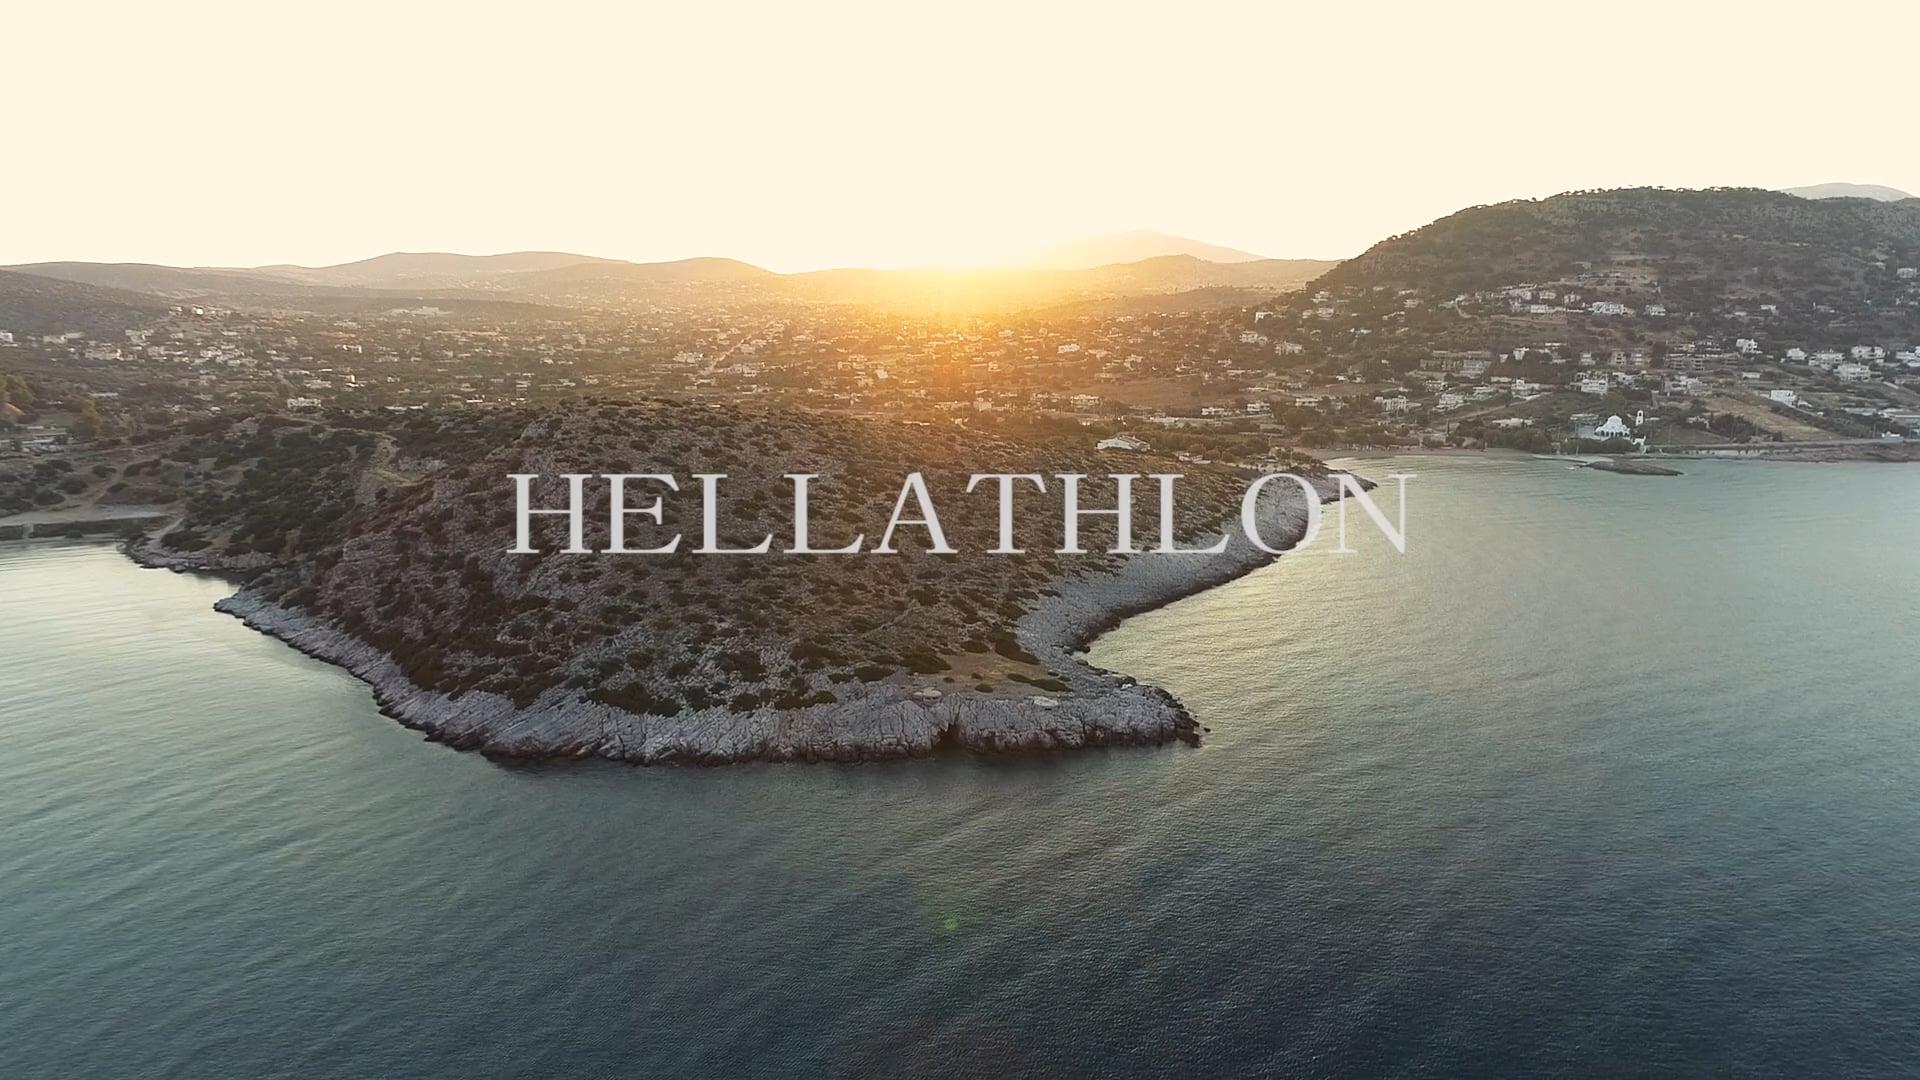 Hellathlon